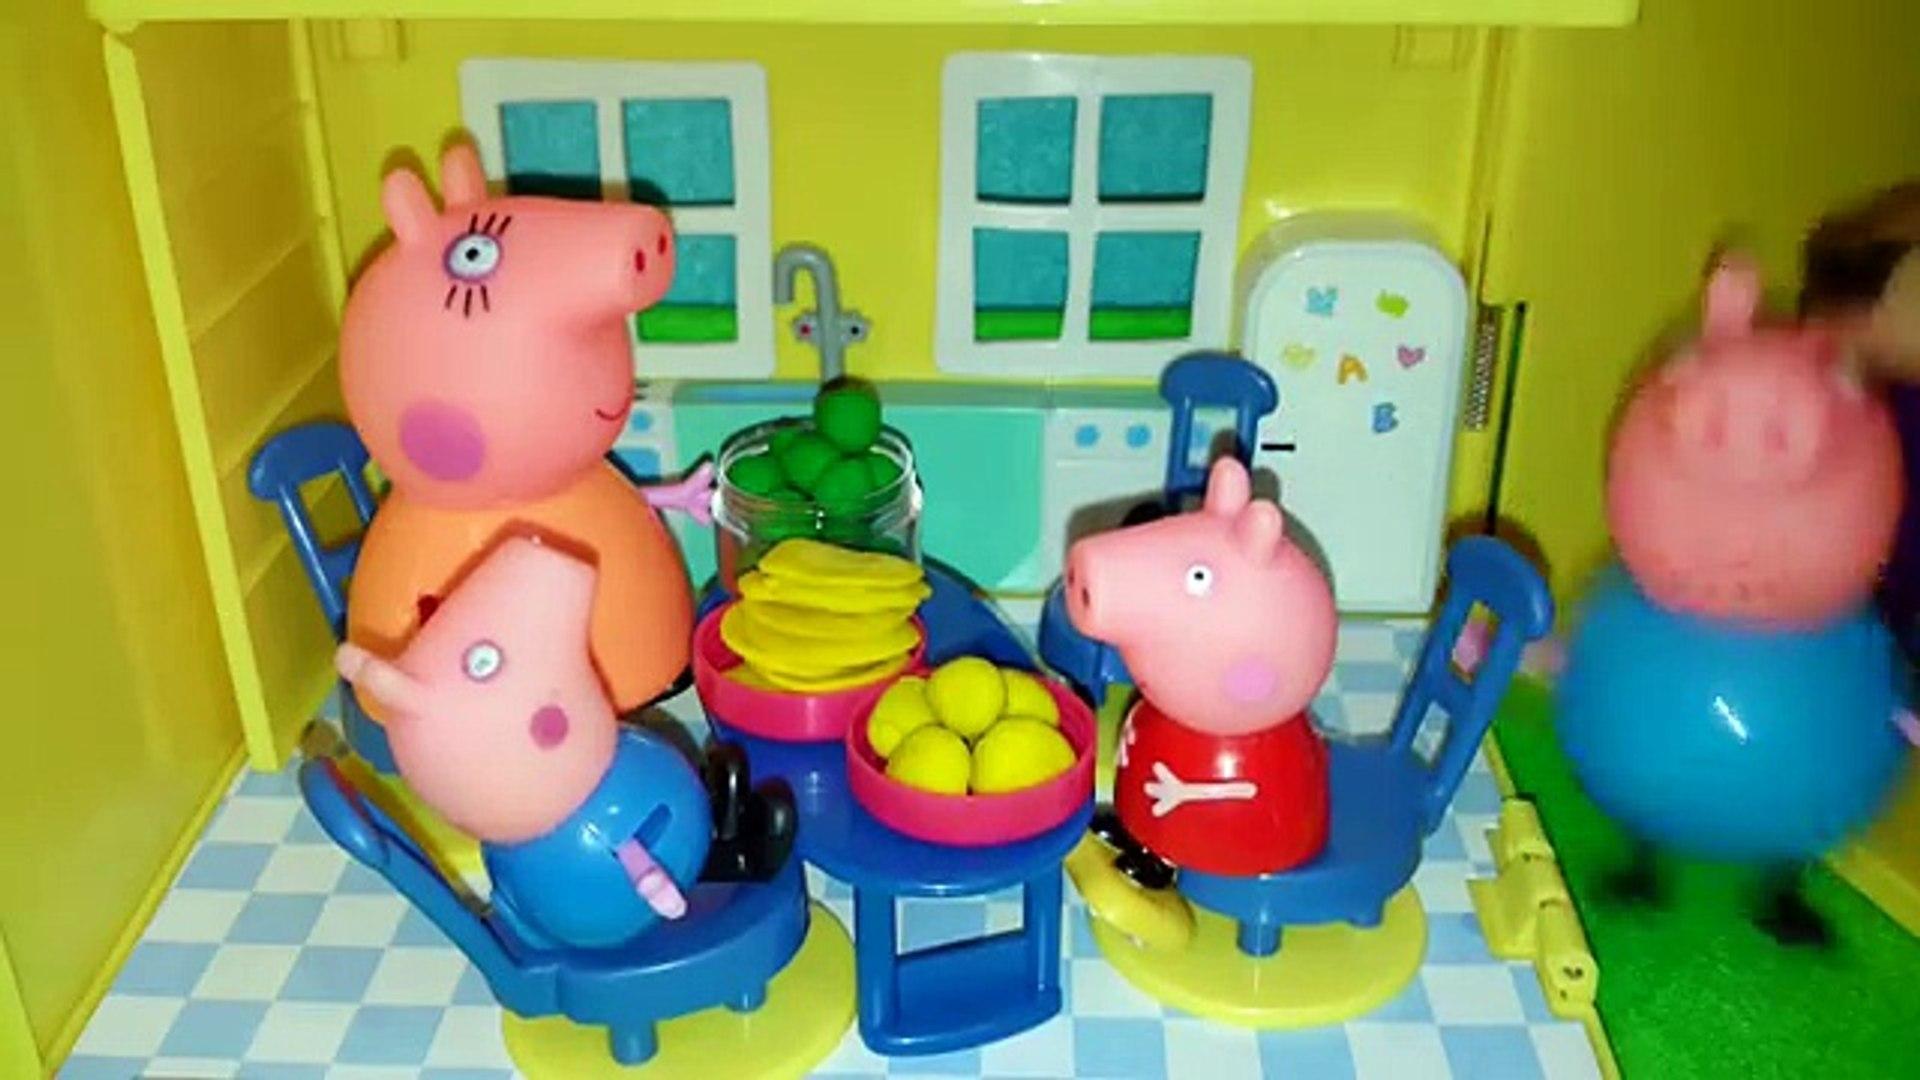 Peppa Pig Garden Свинка Пеппа Огород Собирают овощи ペッパピッグ庭の野菜を収集 MLG Peppa goes in grandp